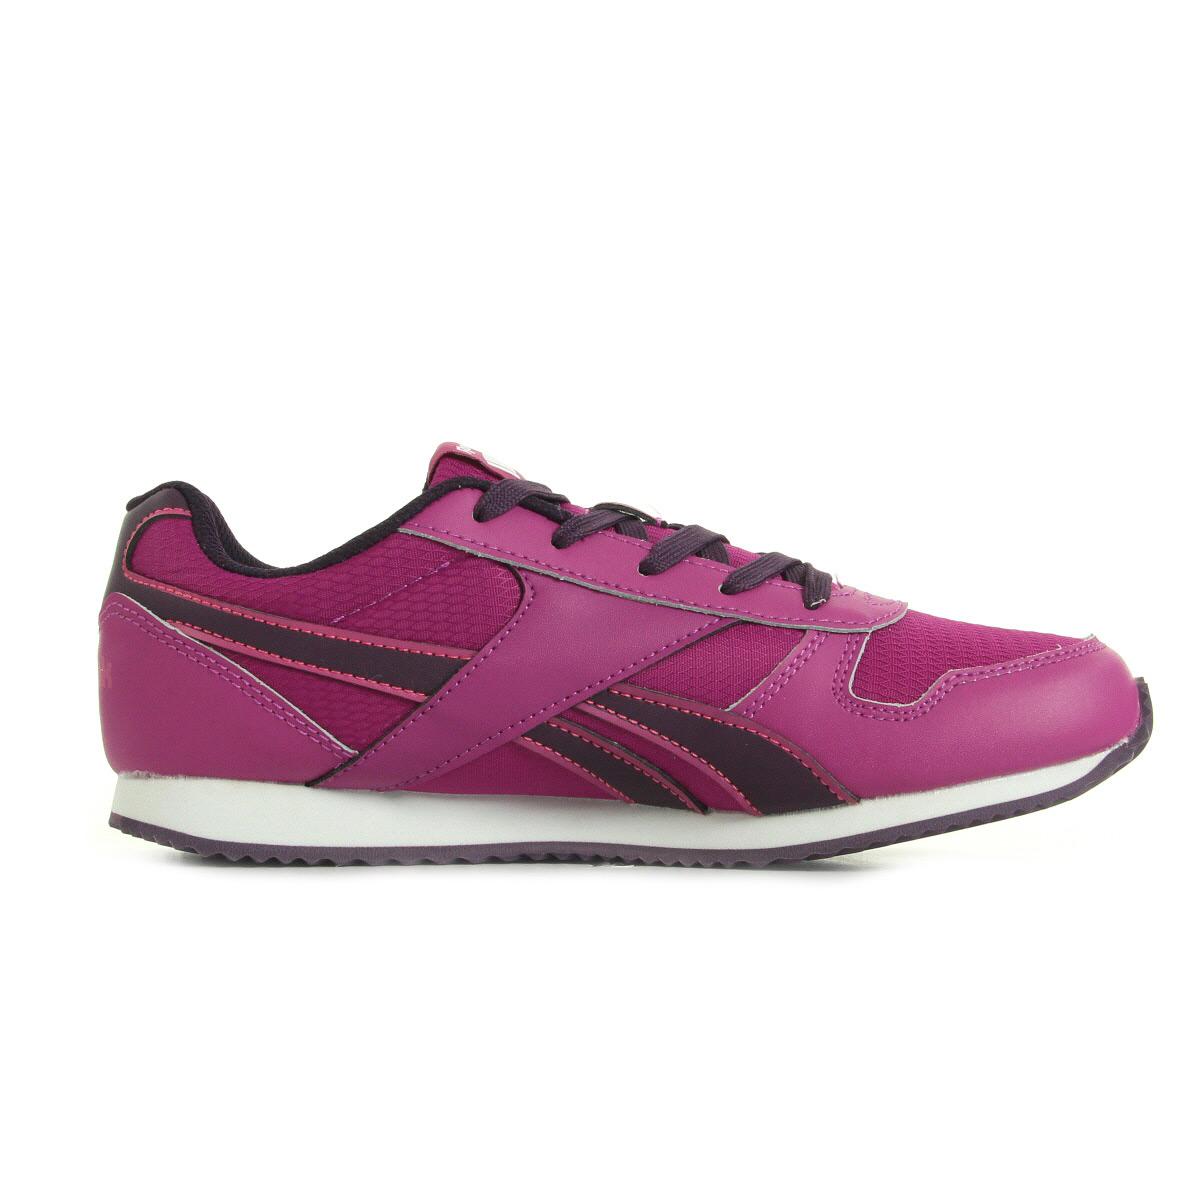 schuhe reebok damen royal cl jogger rosa ebay. Black Bedroom Furniture Sets. Home Design Ideas